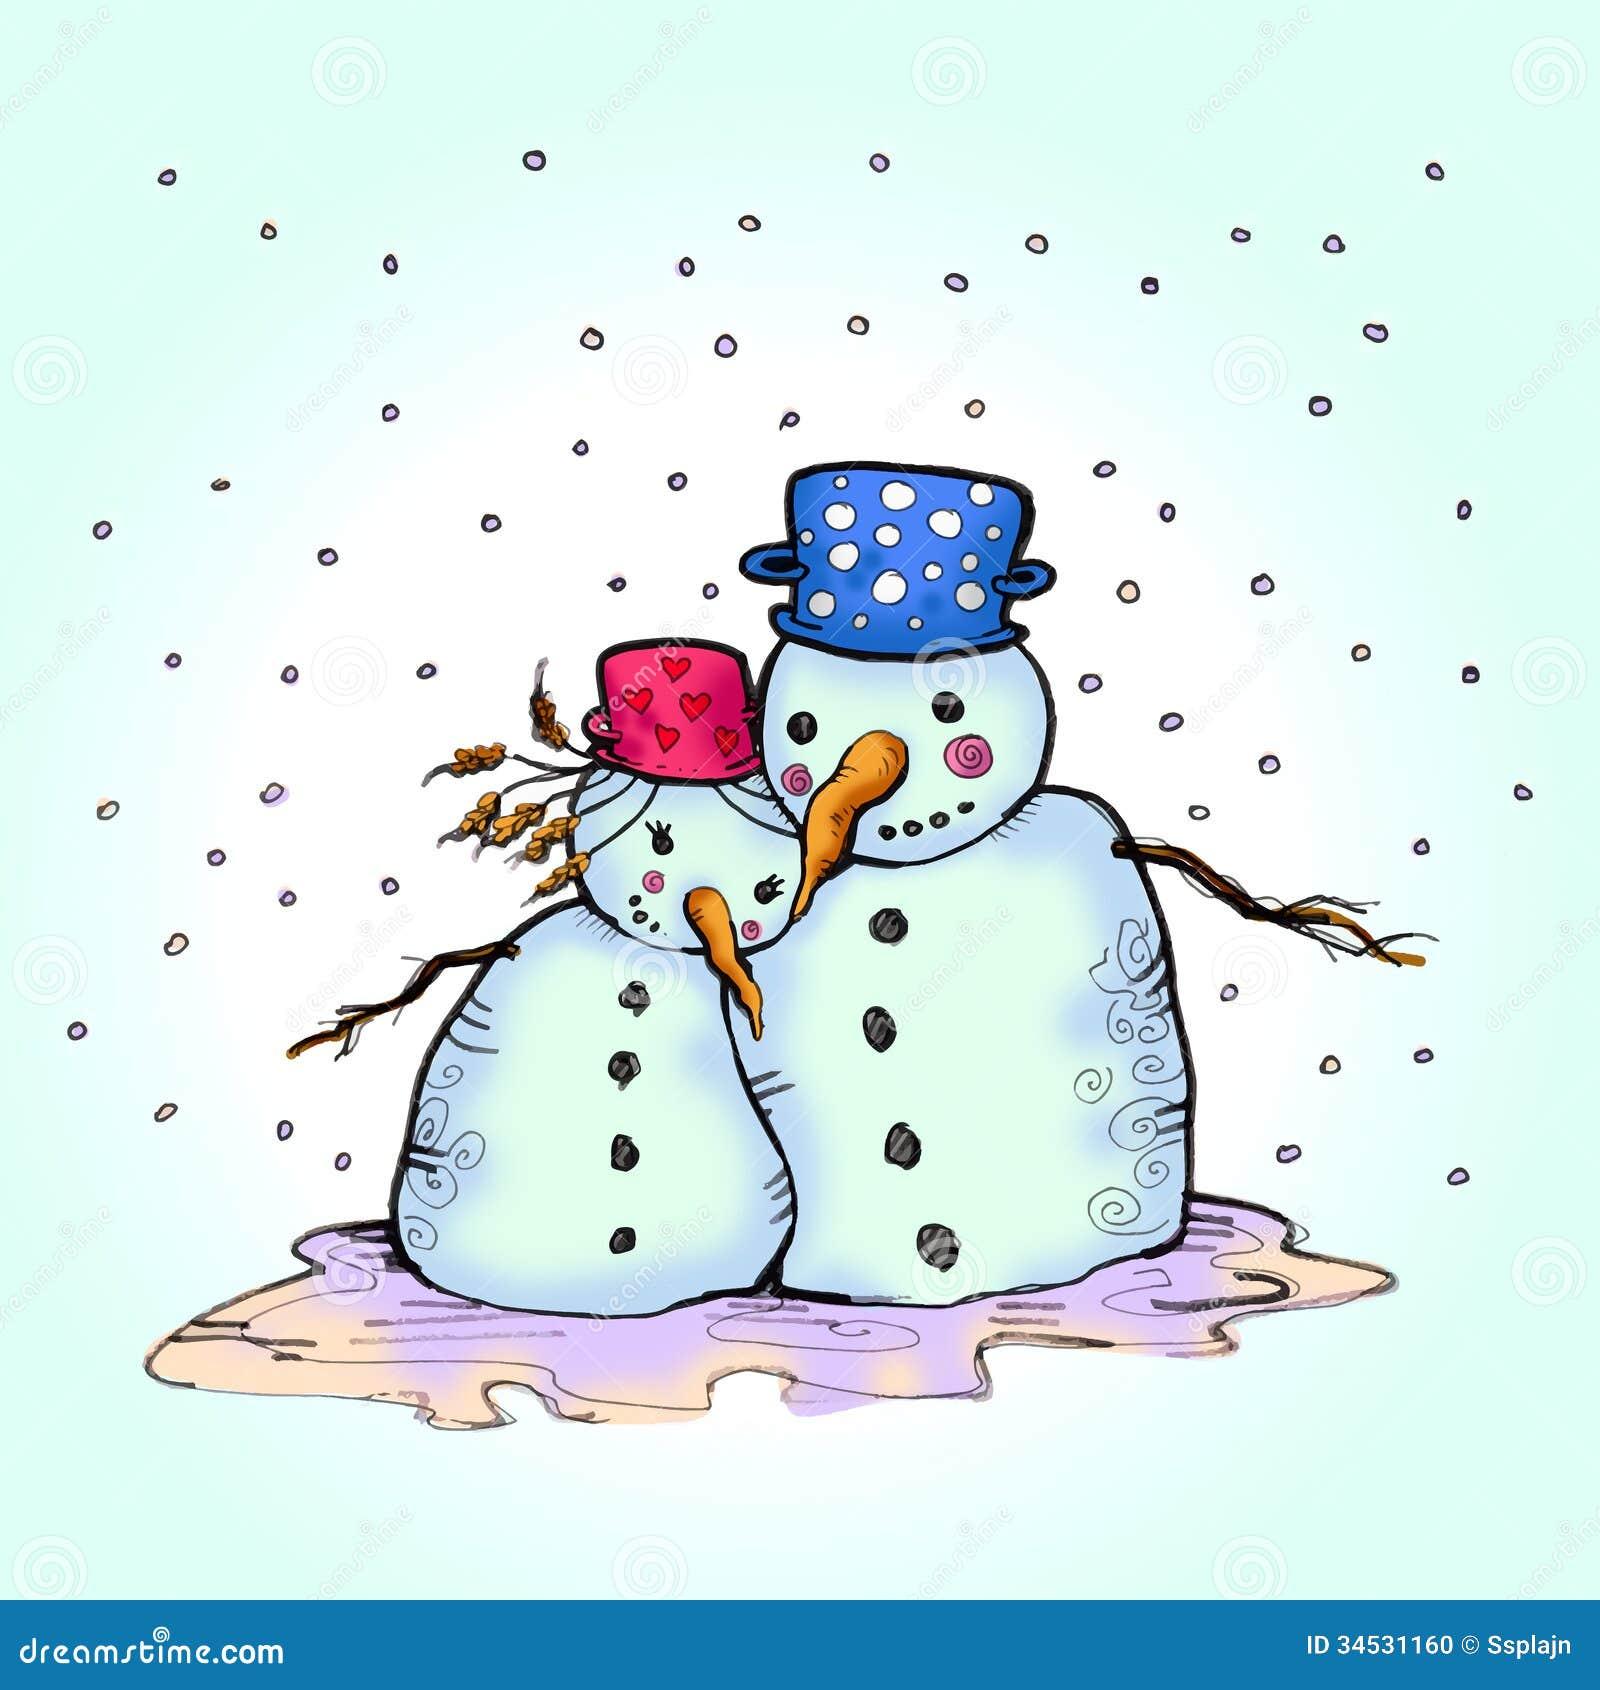 winter dreams christmas love pdf